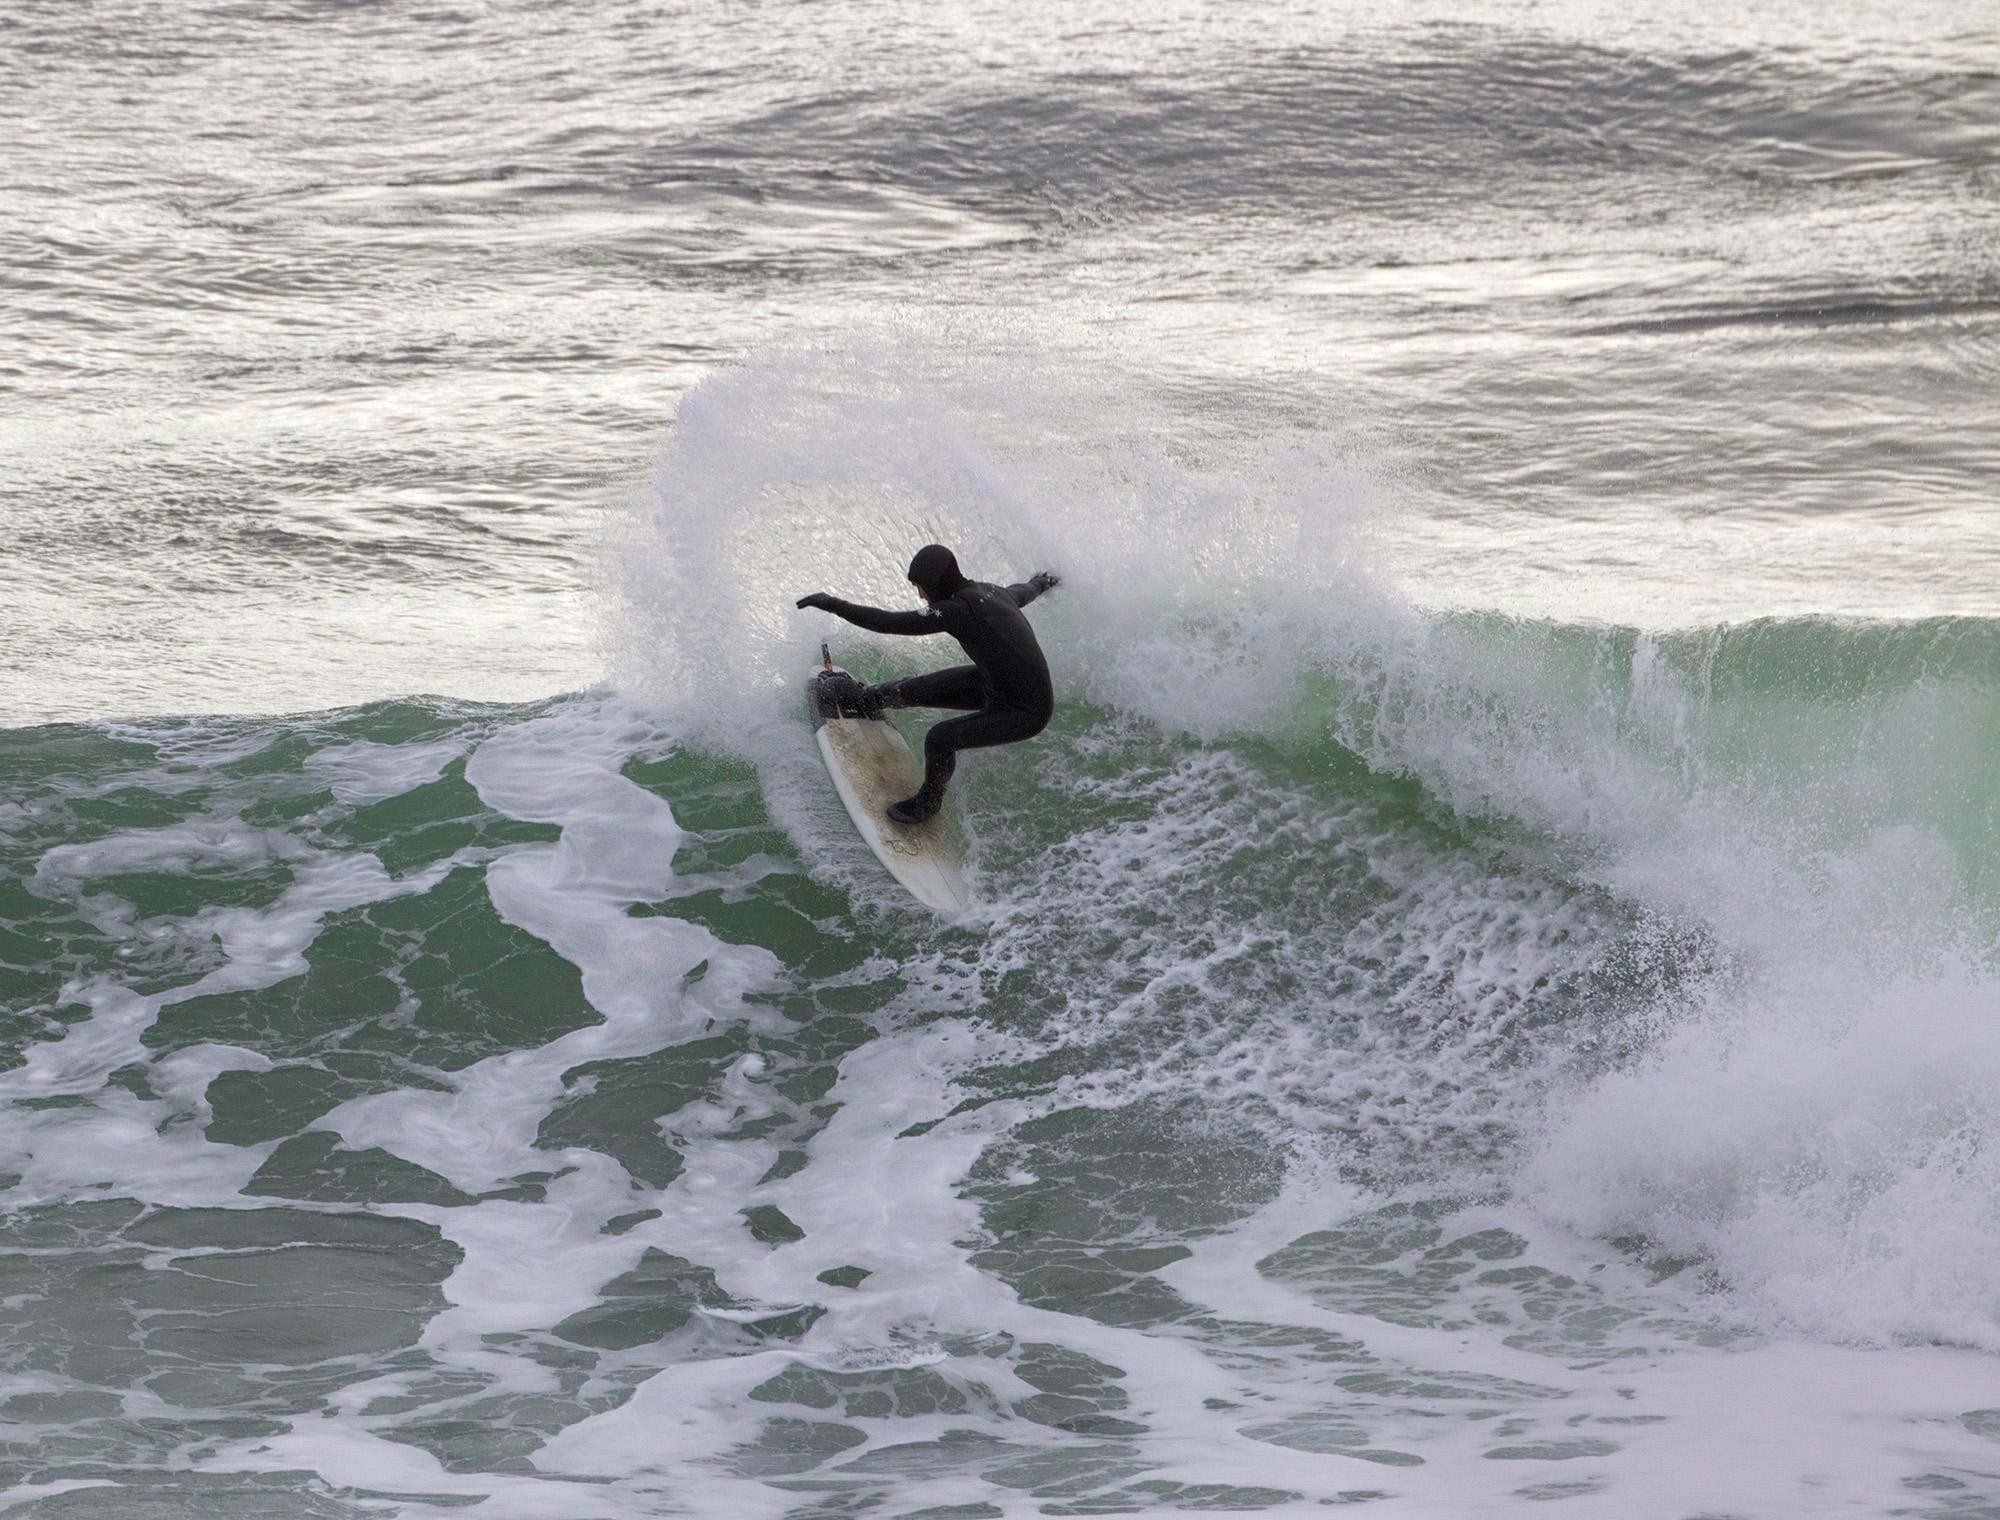 1-19-17 MTK Surfer 10.jpg